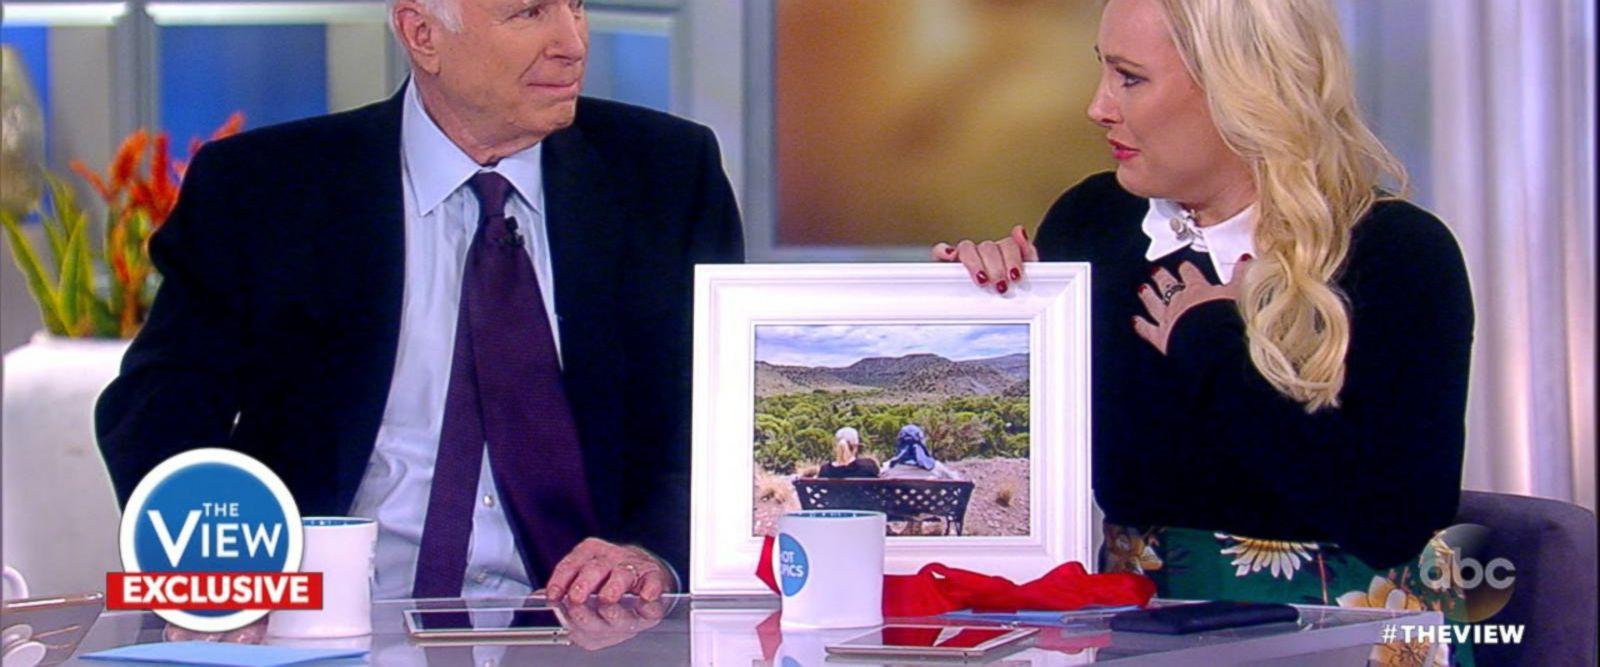 VIDEO: Sen. John McCain gives daughter Meghan McCain a special birthday gift